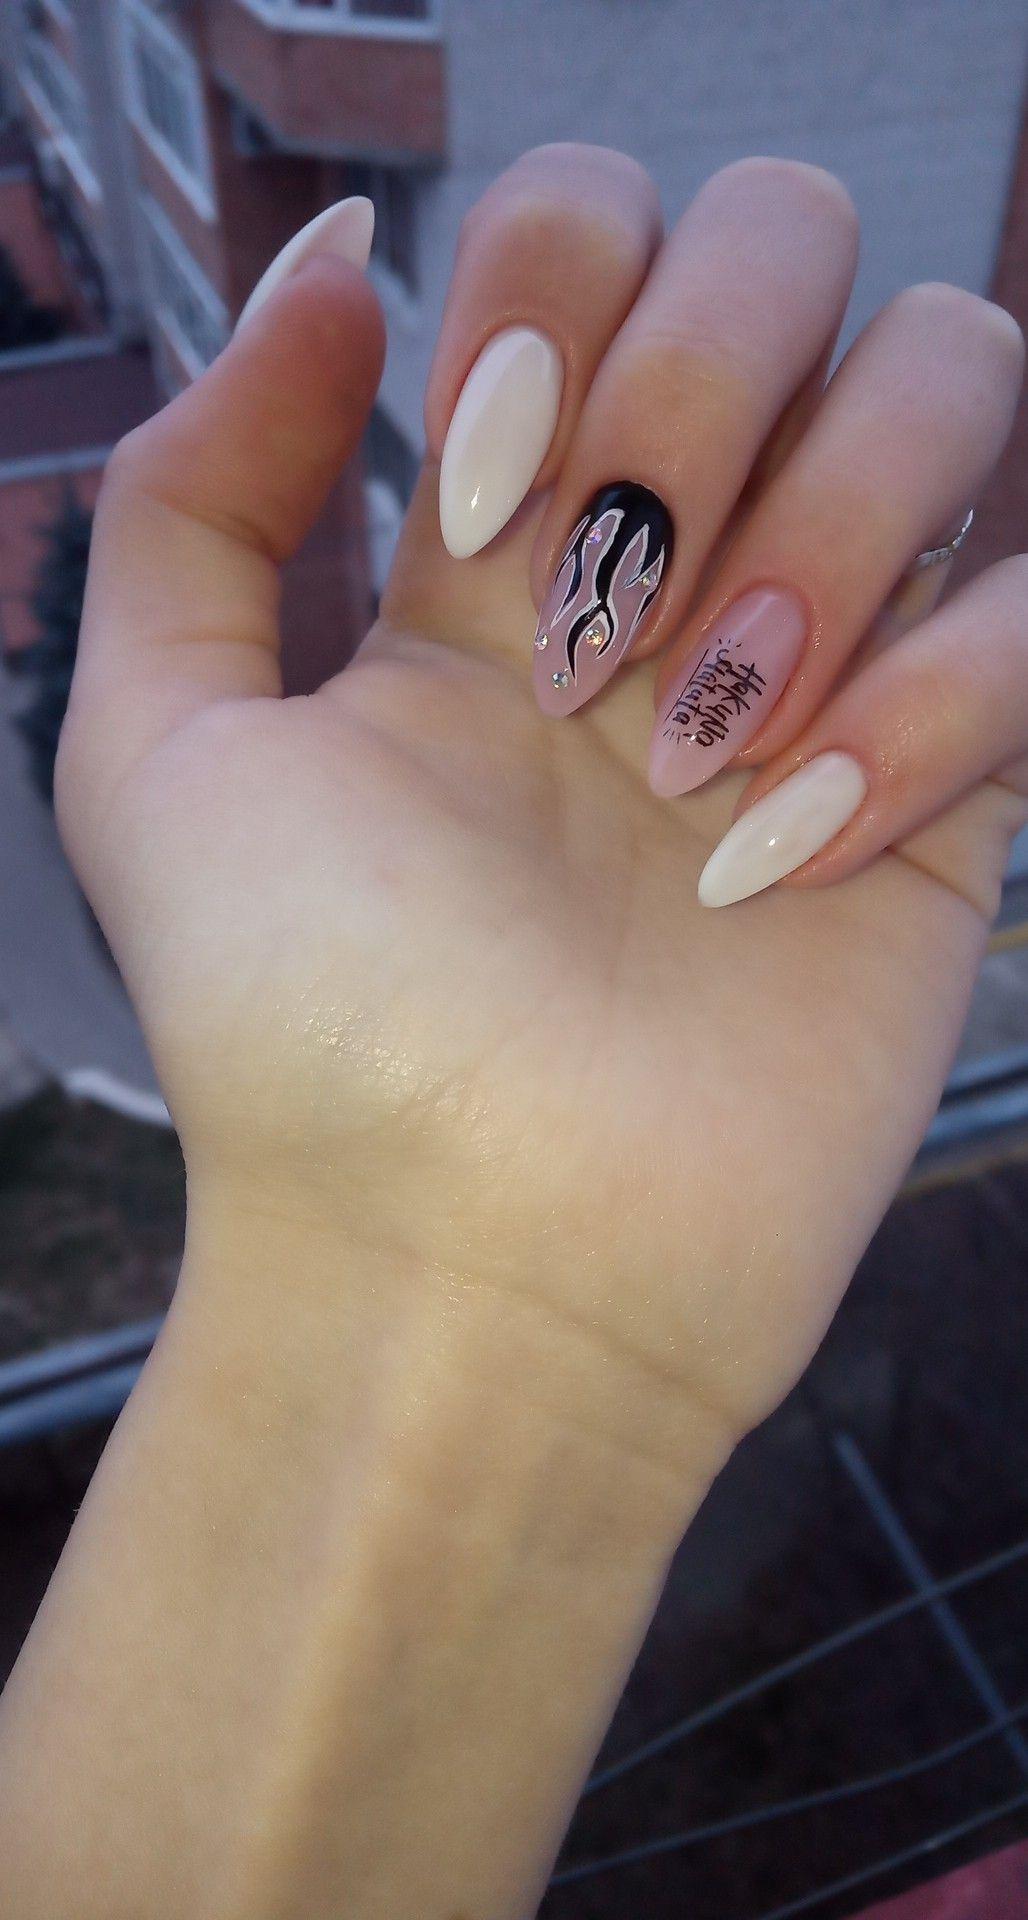 Pin By Natty On Nails In 2020 Barevne Nehty Gelove Nehty